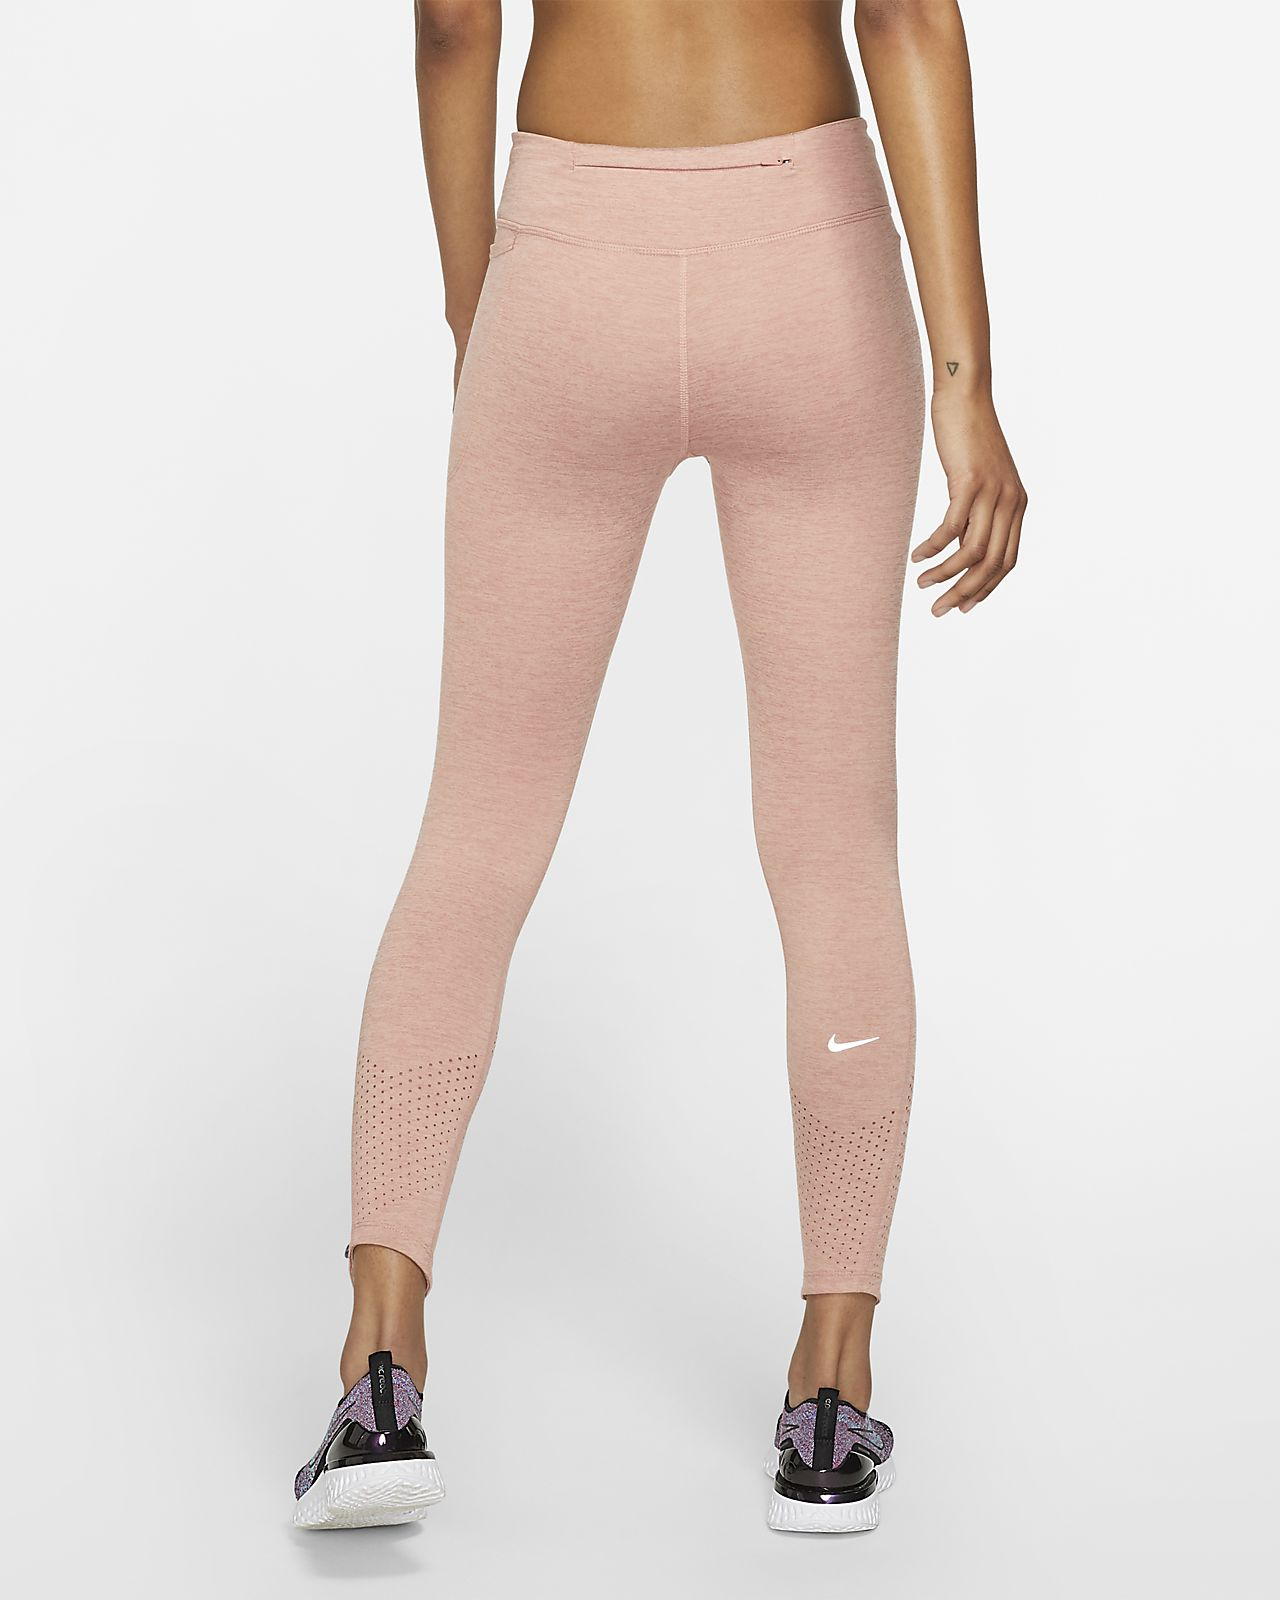 nike leggings schwarz rosa